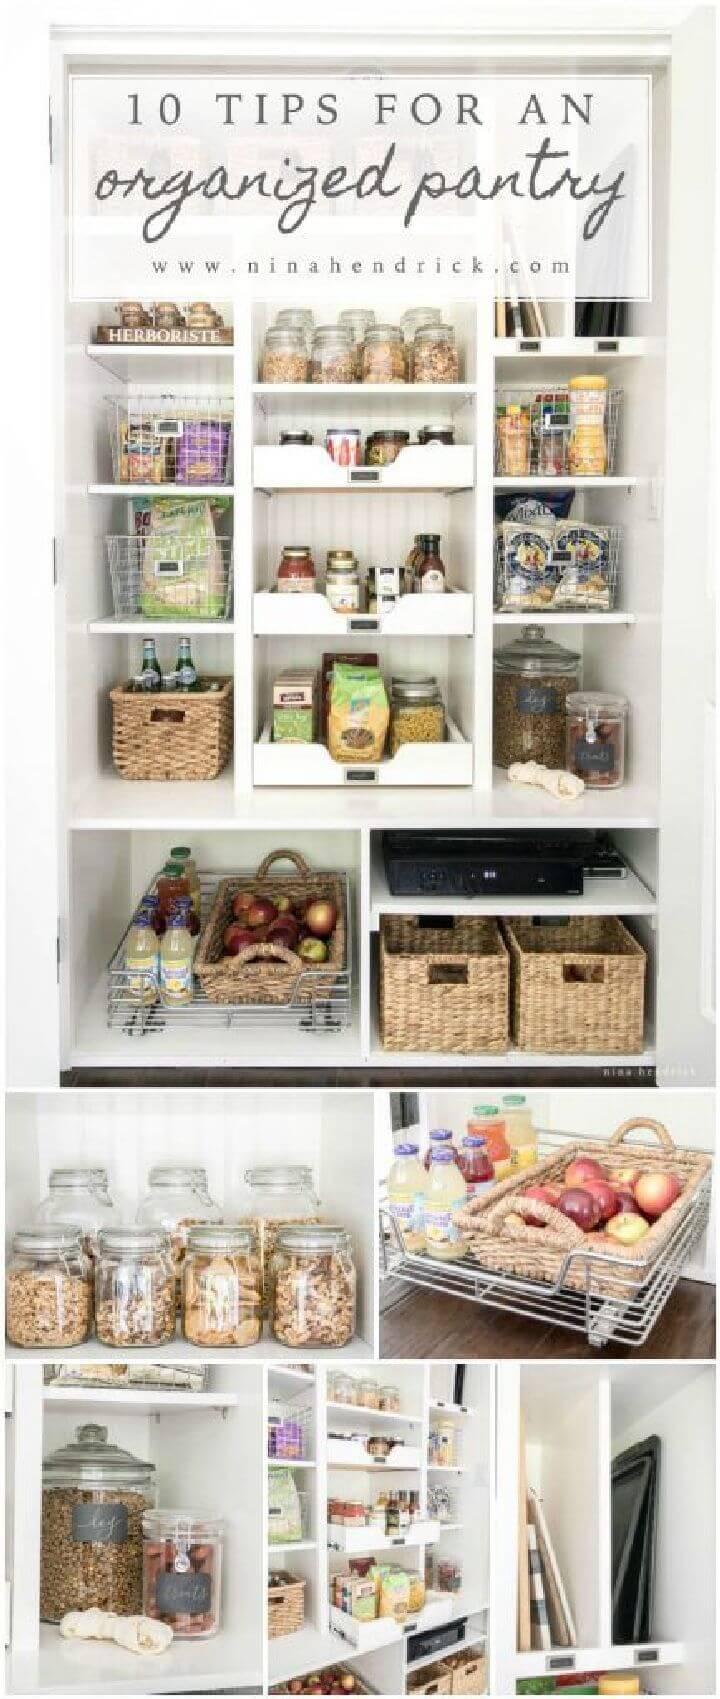 60 best pantry organization ideas - diy - page 4 of 12 - diy & crafts